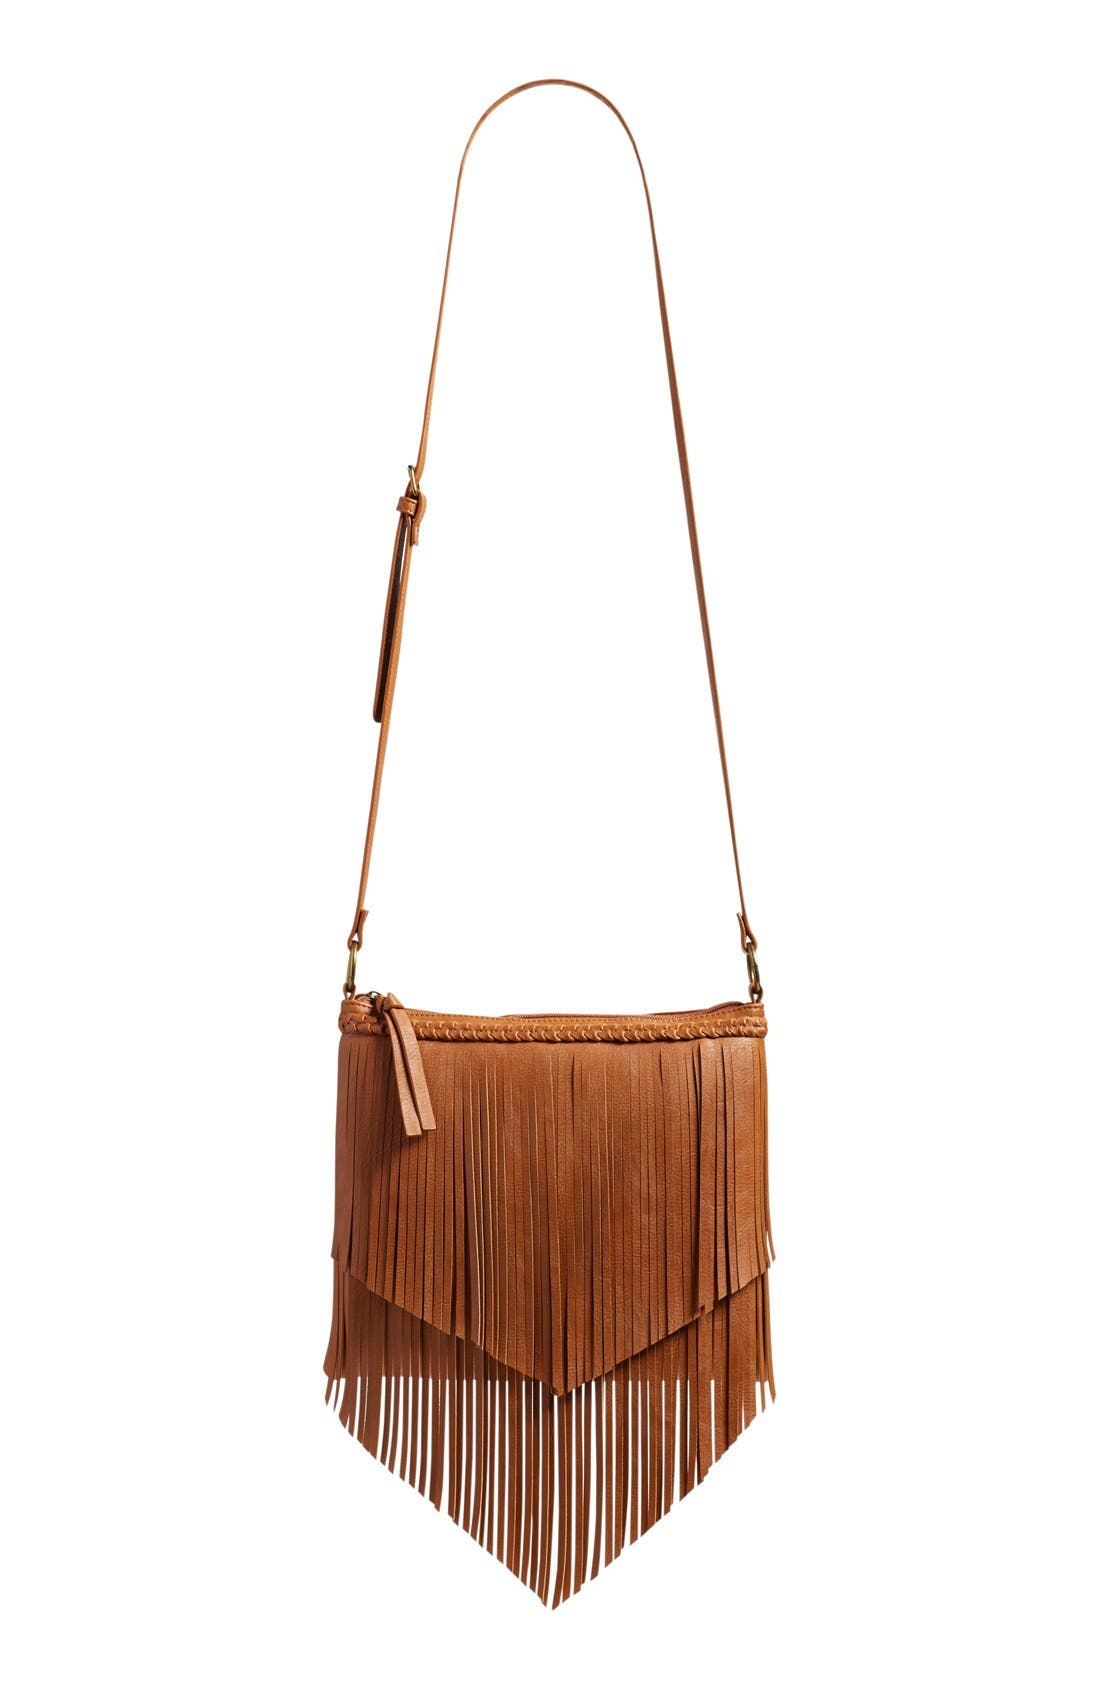 Alternate Image 1 Selected - BP. Layered Fringe Crossbody Bag